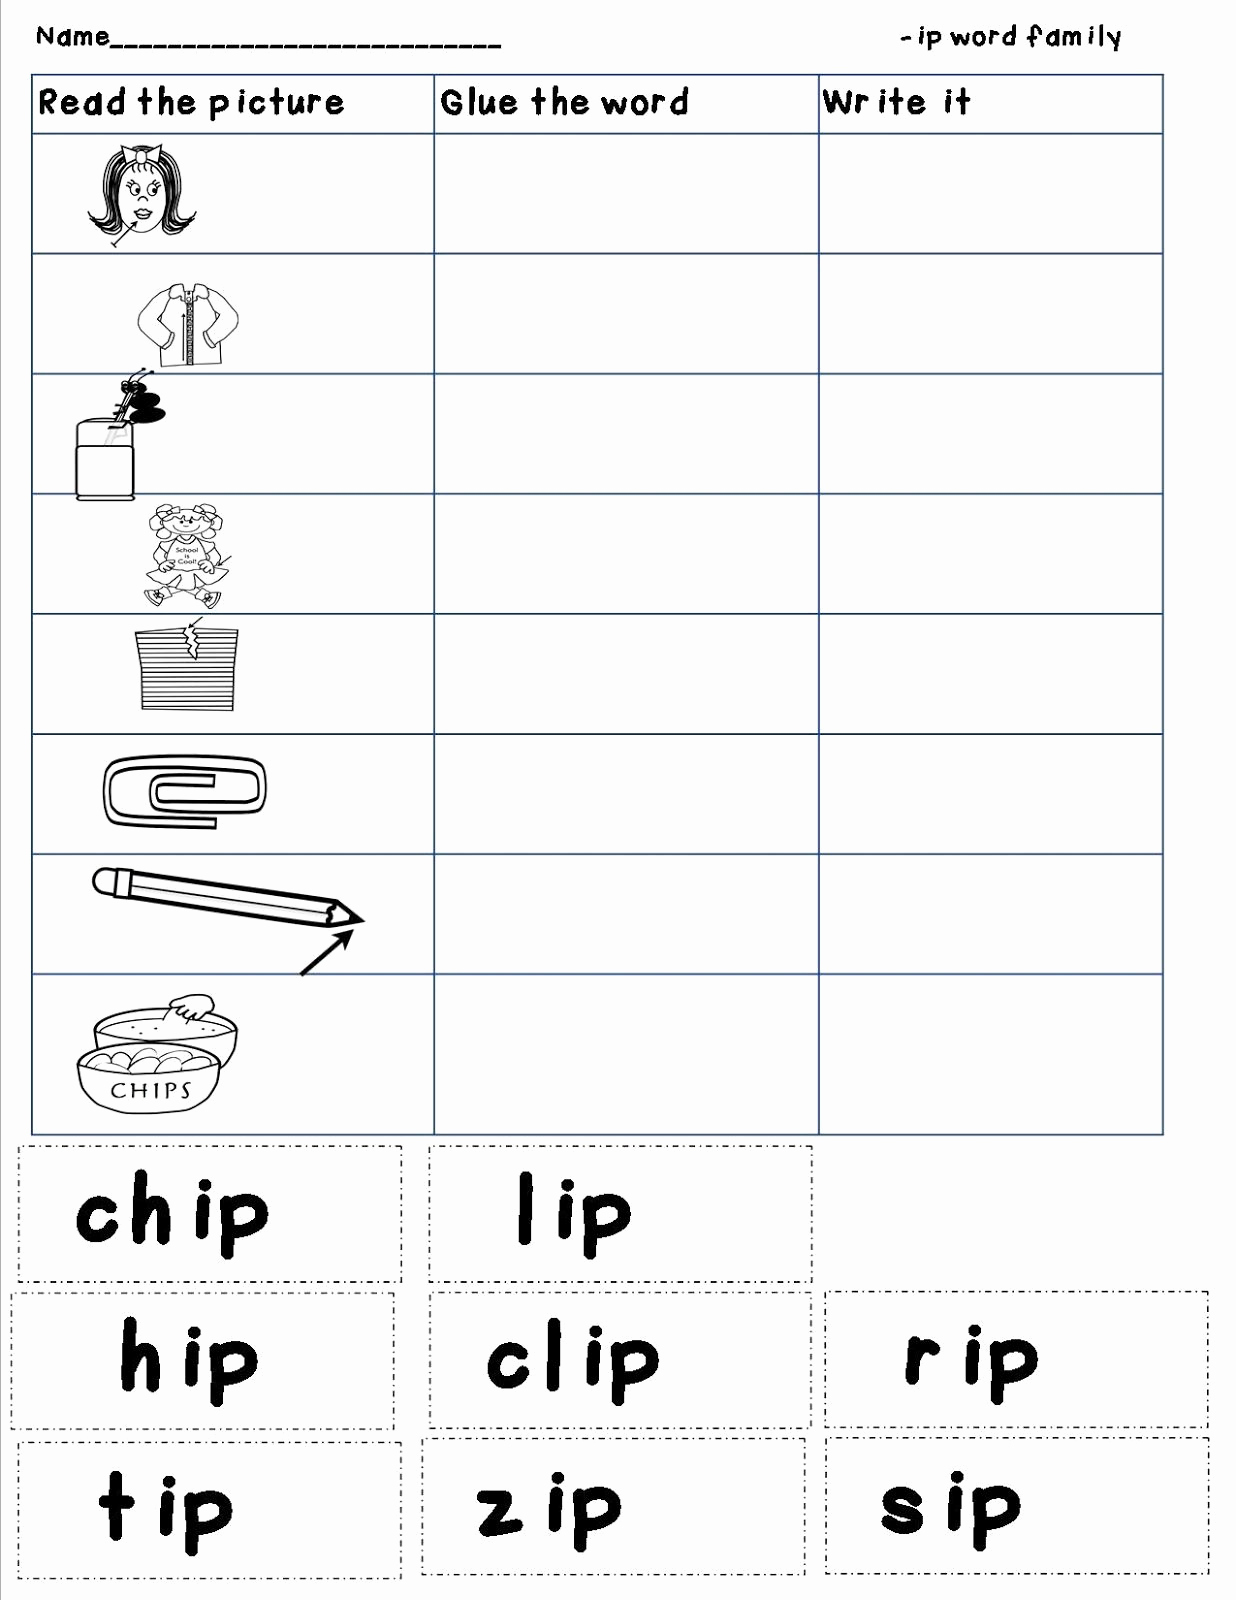 Word Family Worksheet Kindergarten Luxury Mrs Bohaty S Kindergarten Kingdom